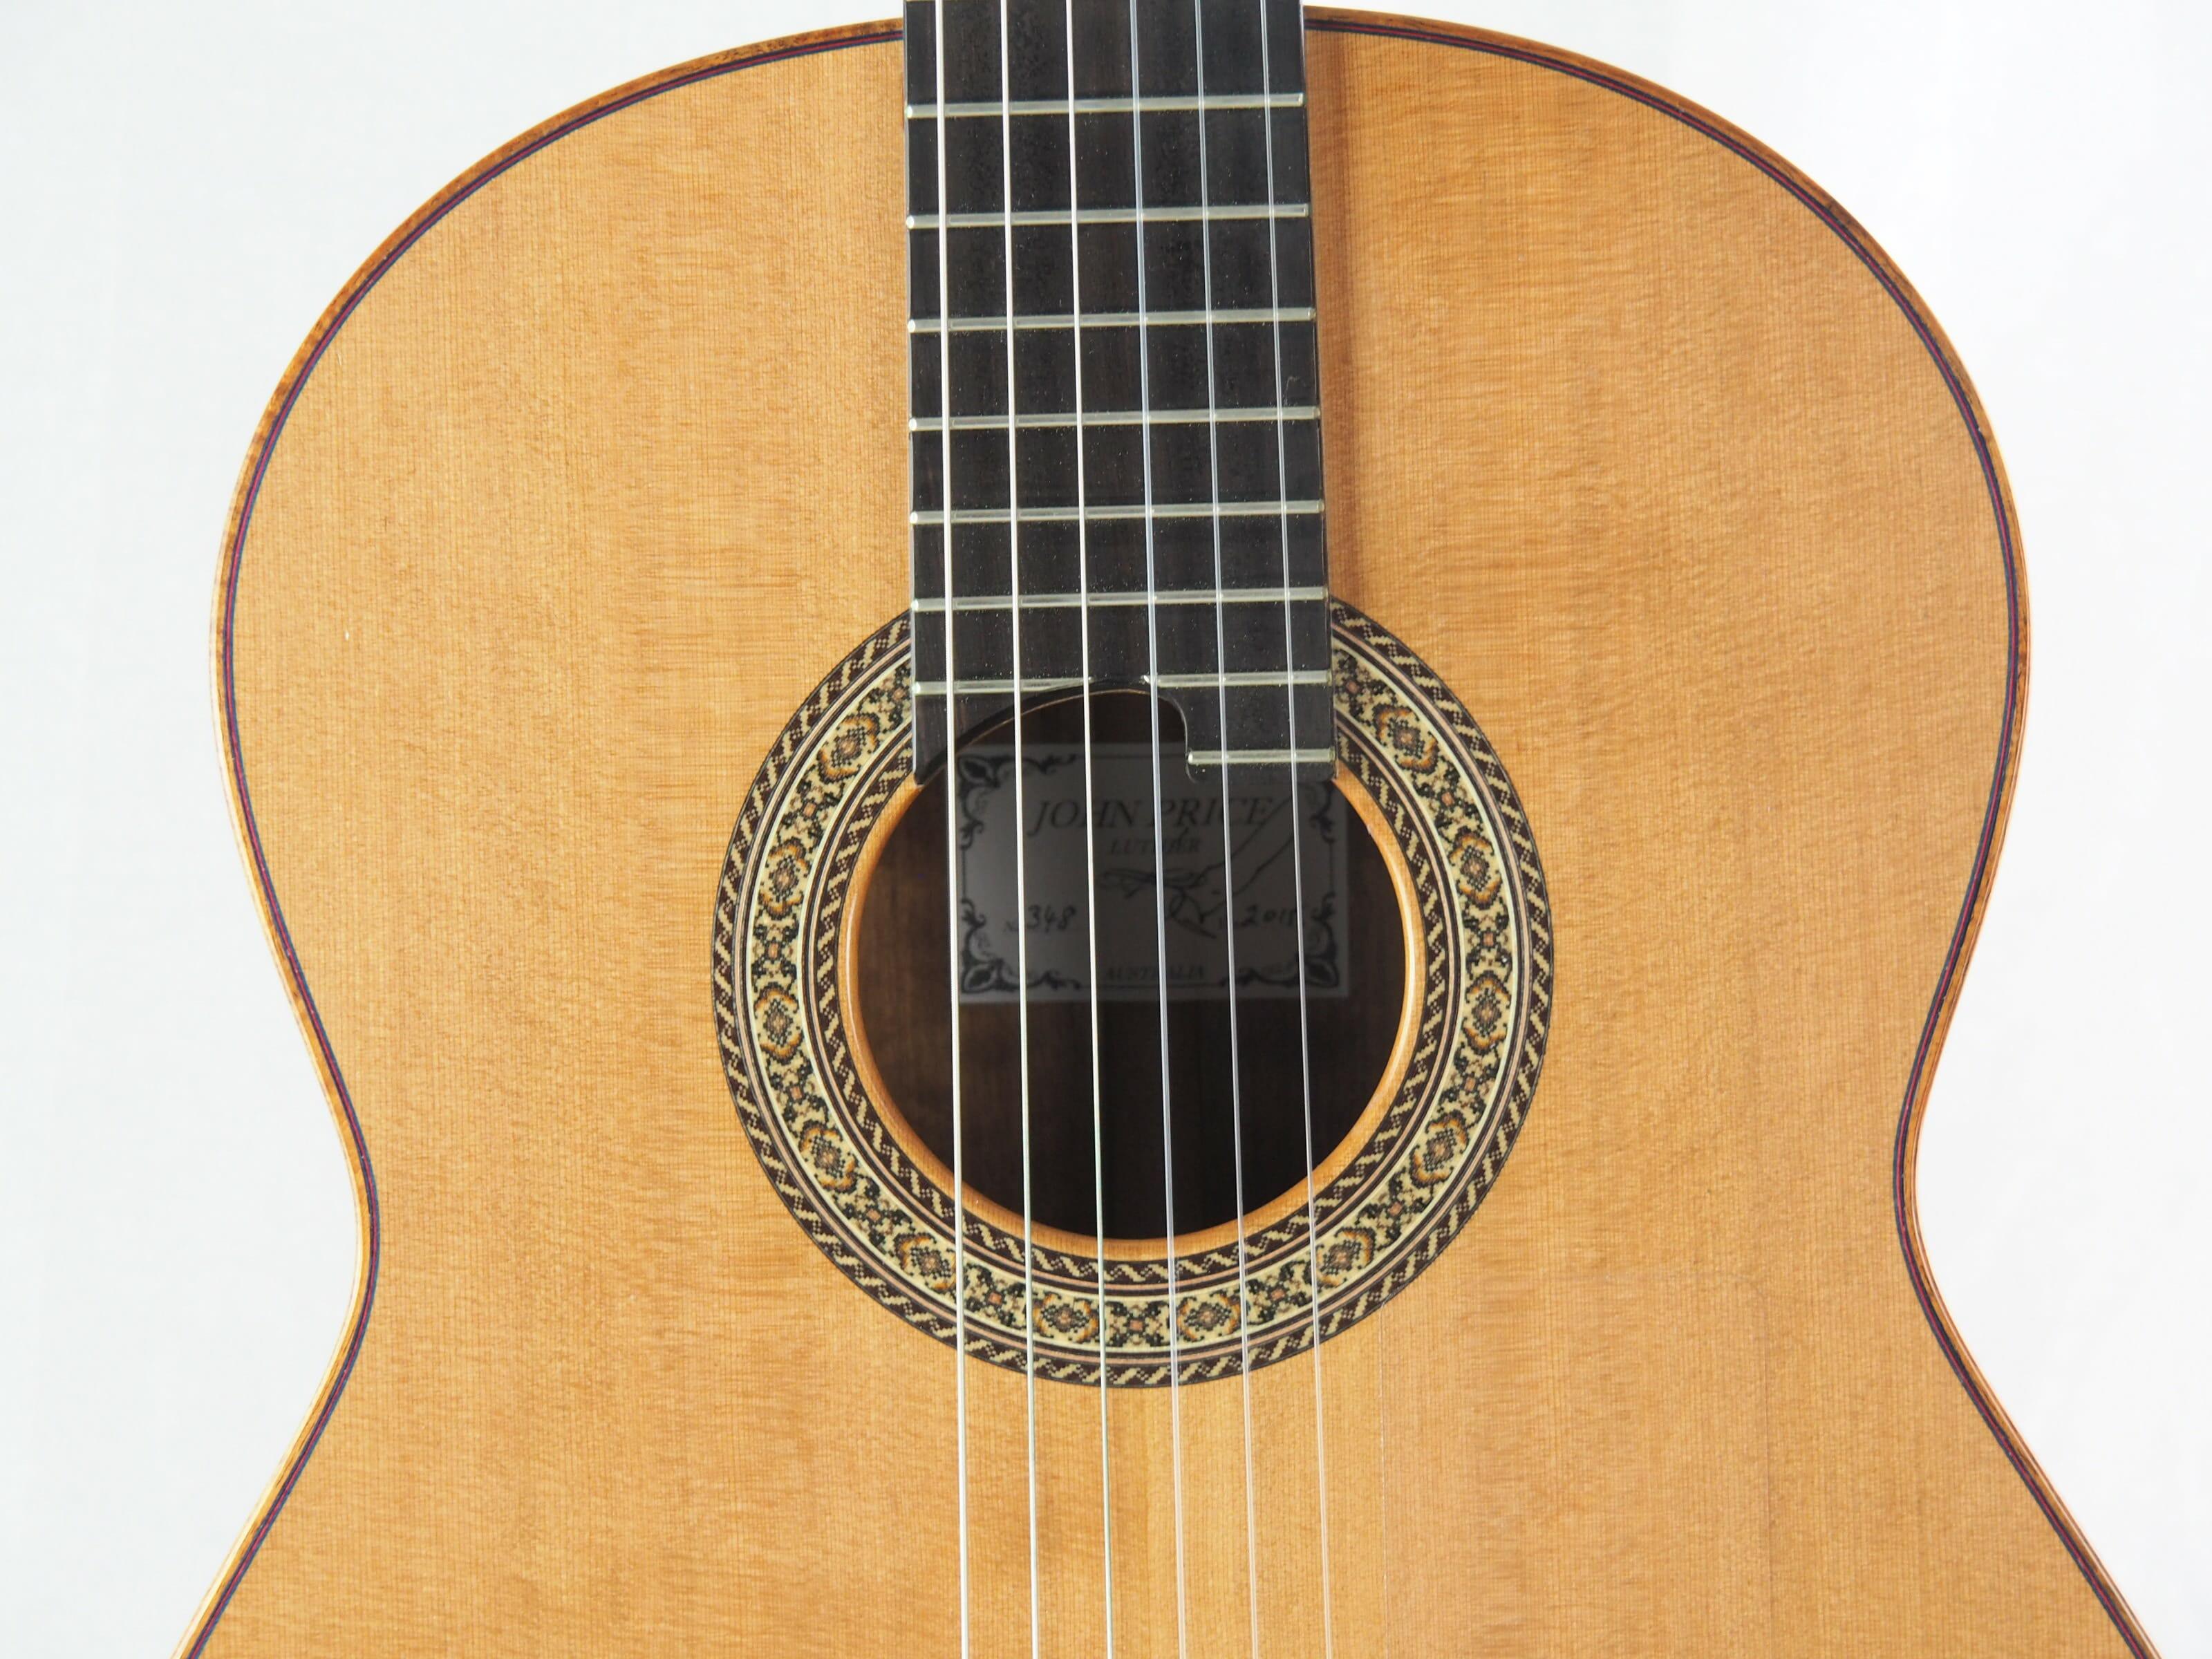 John Price luthier guitare classique No 19PRI348-10